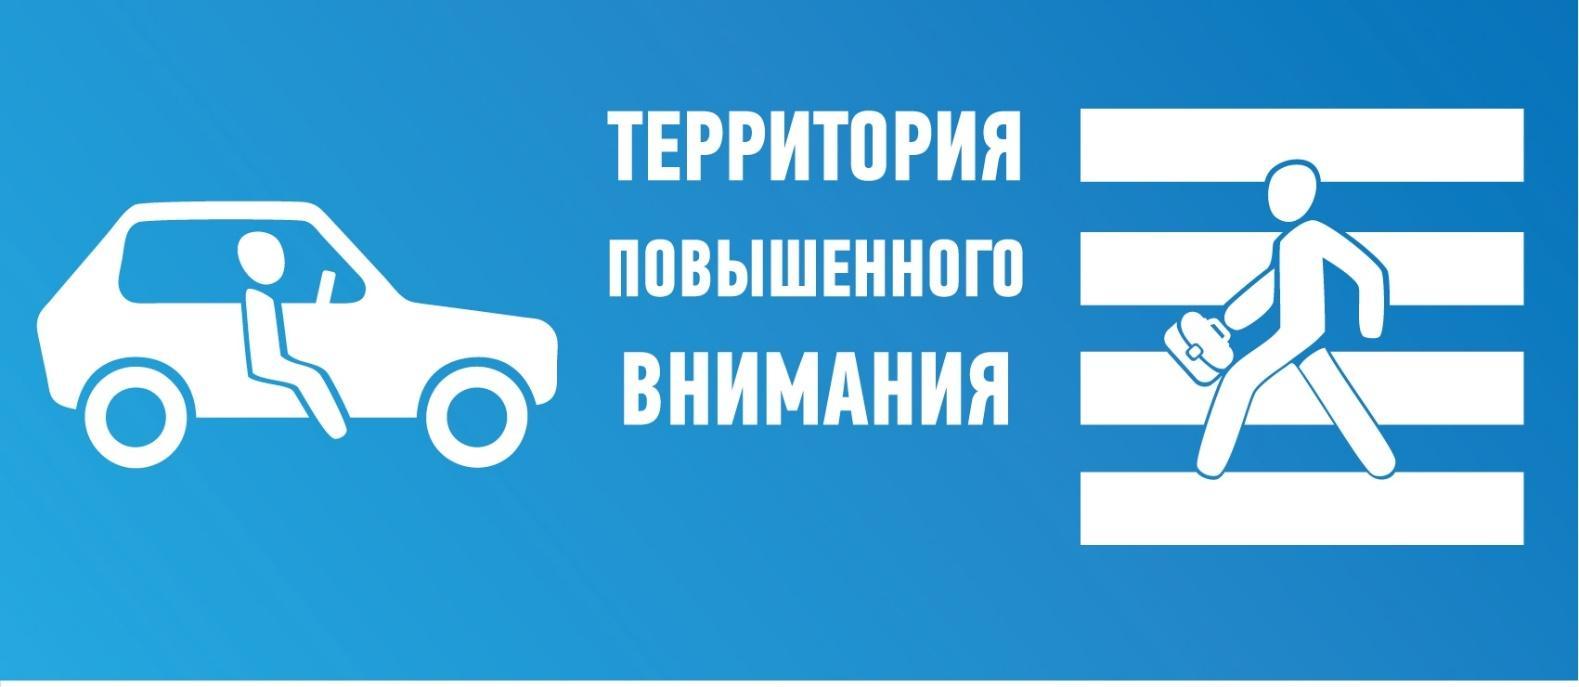 http://static.mvd.ru/upload/site23/document_news/7(6).jpg